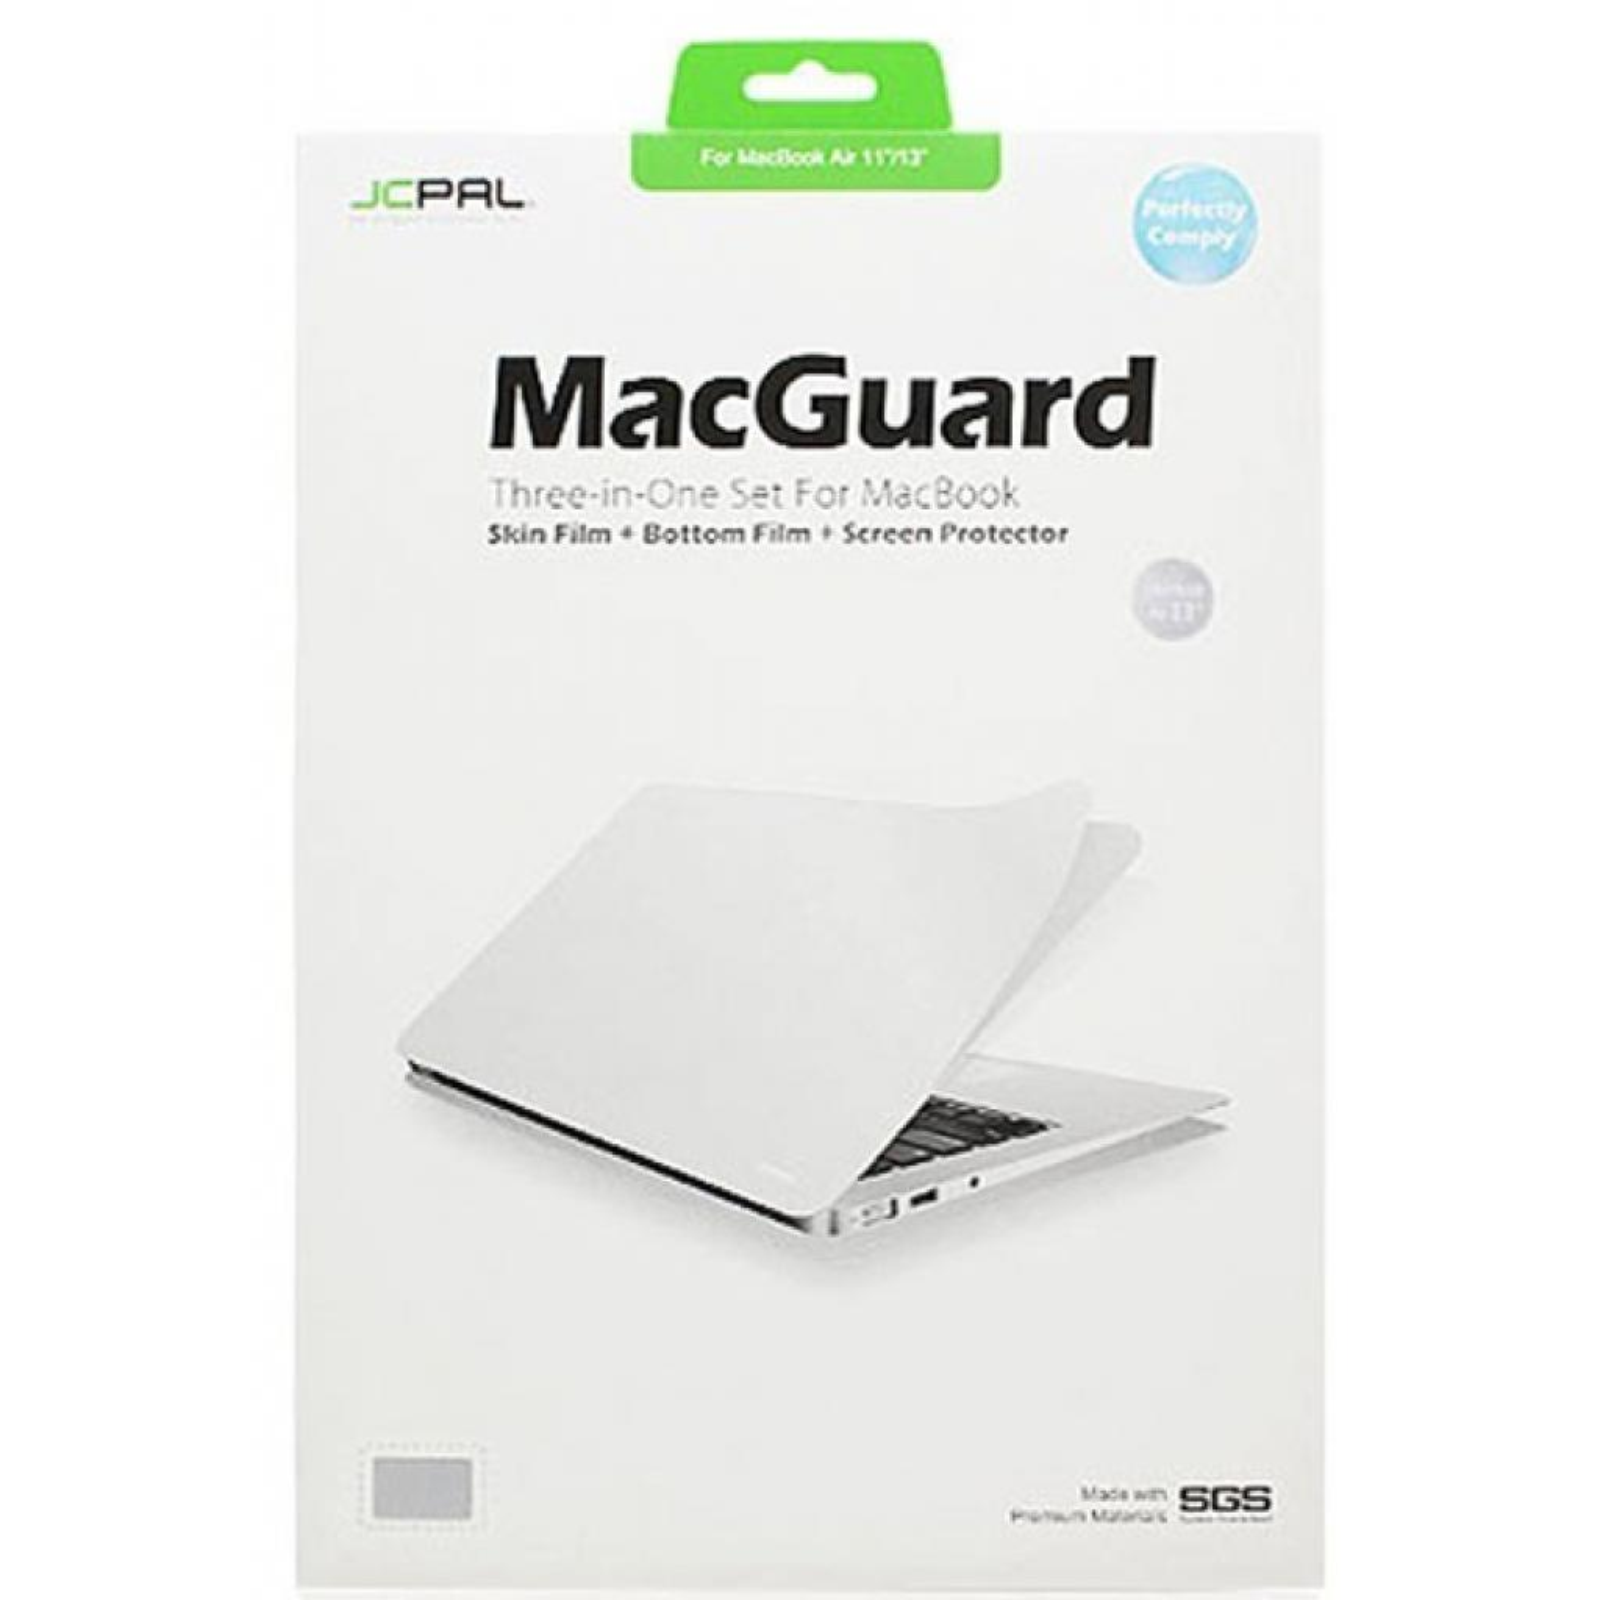 Пленка защитная JCPAL 3 in 1 set для MacBook Air 13 (JCP2044)